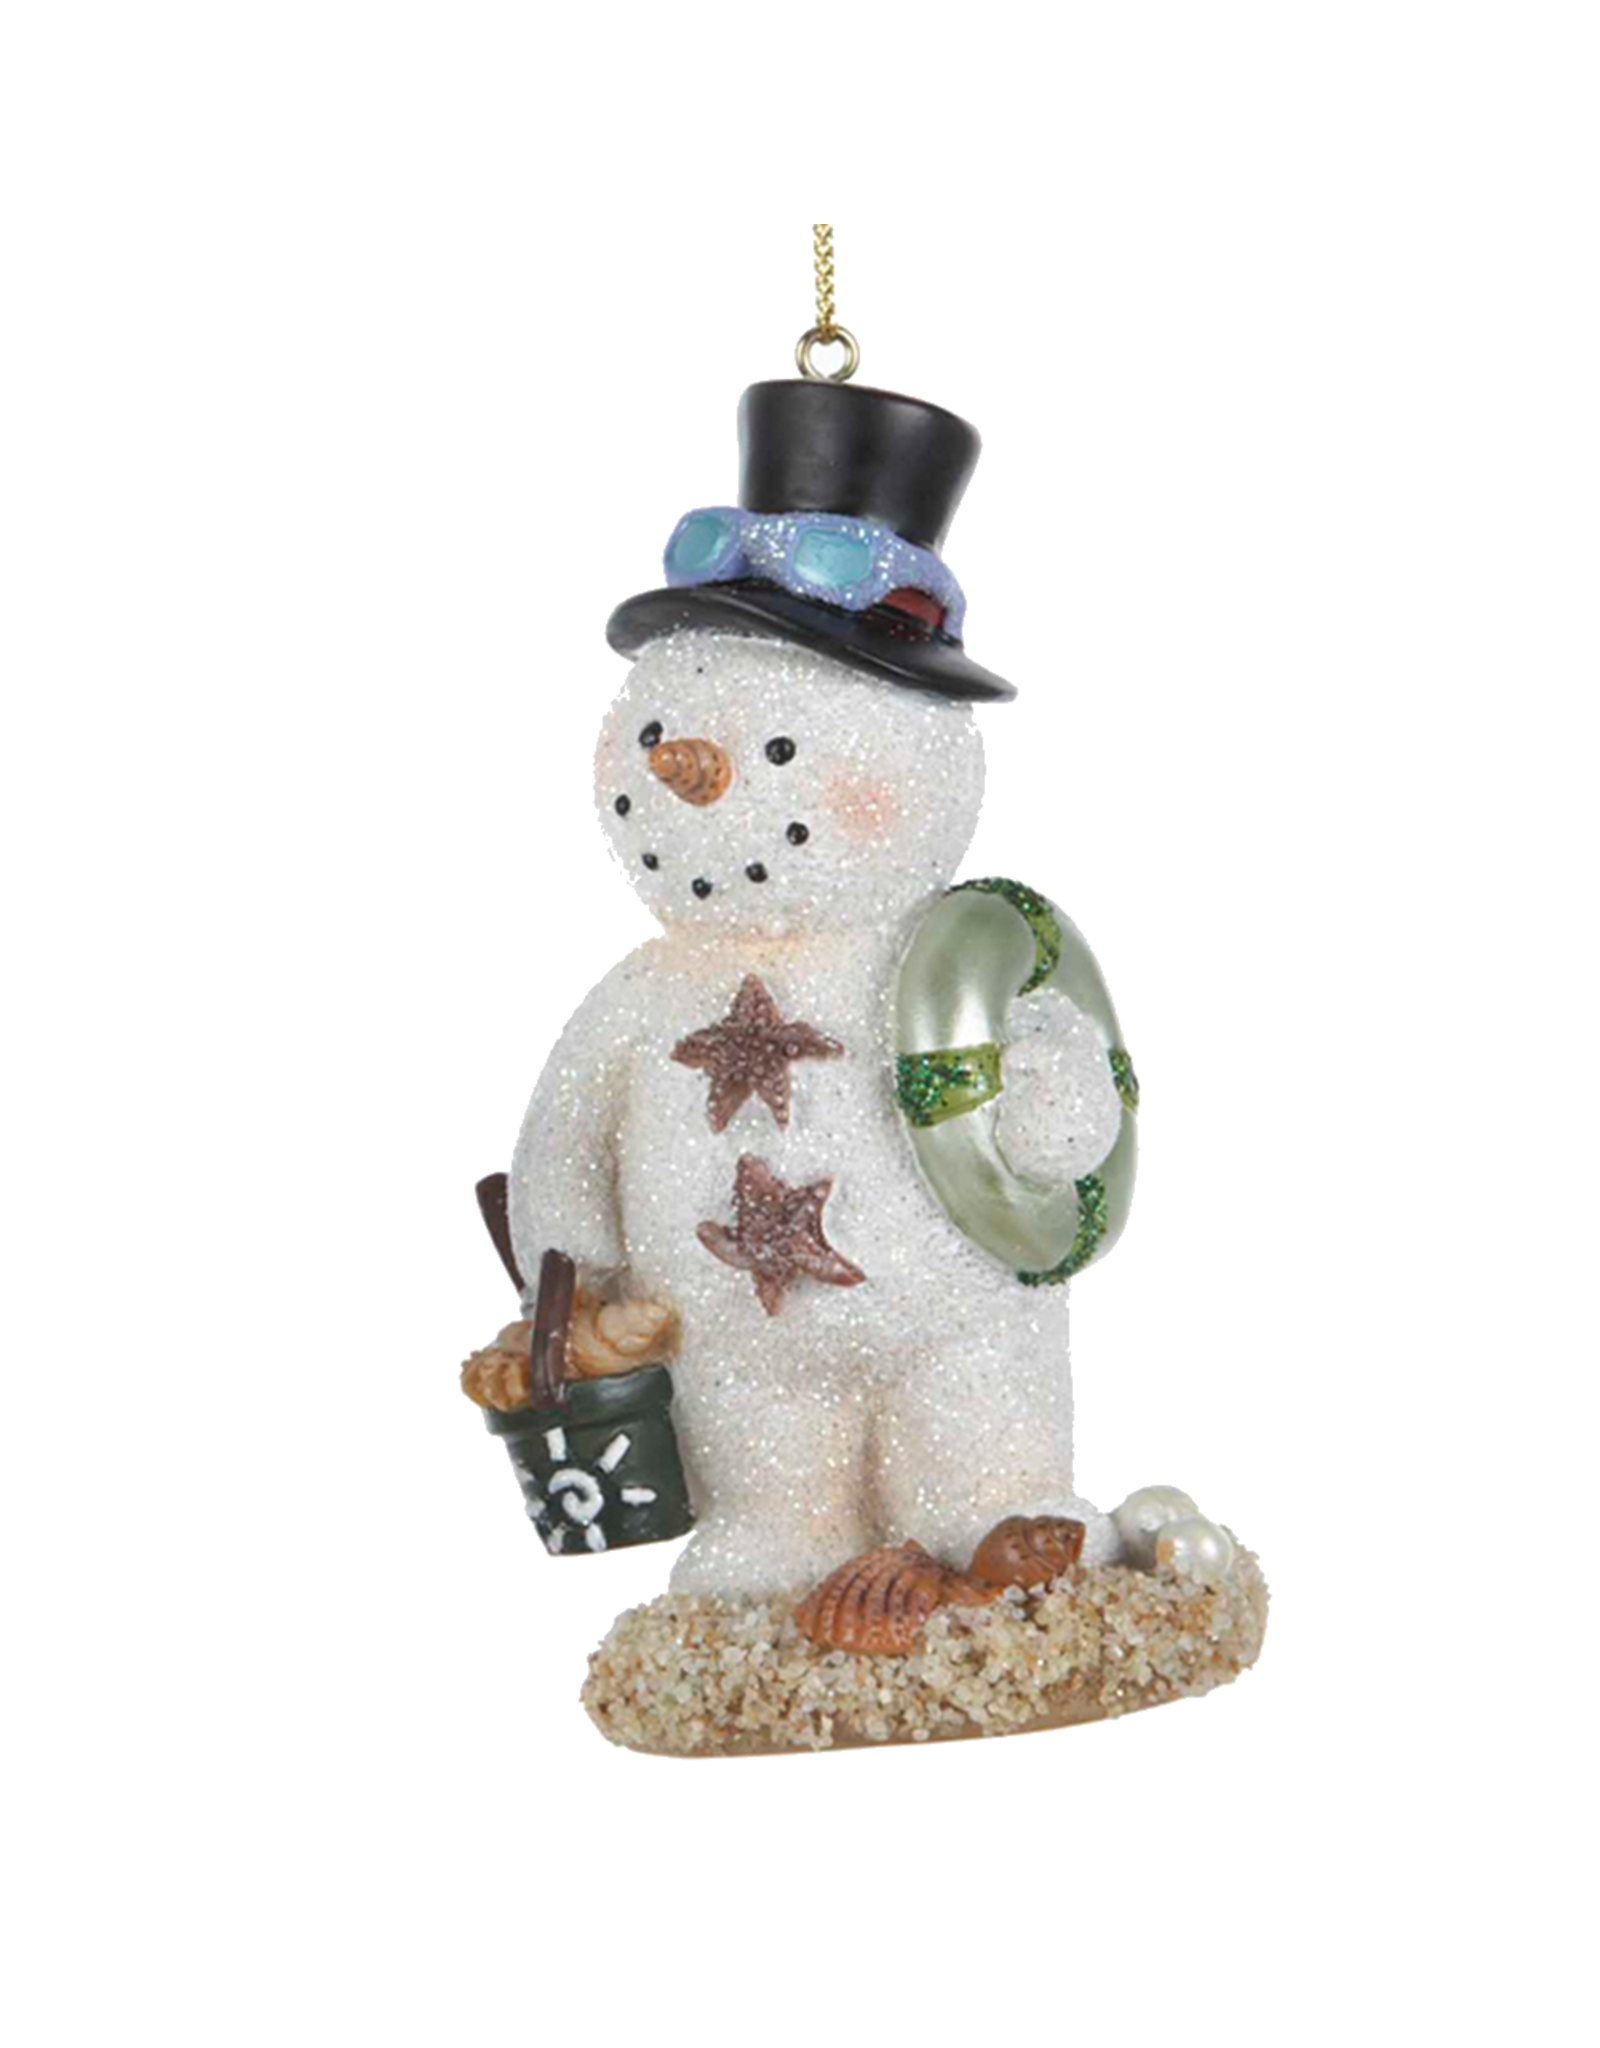 Kurt Adler Beach Snowman Ornament Snow-MAN Christmas Ornament